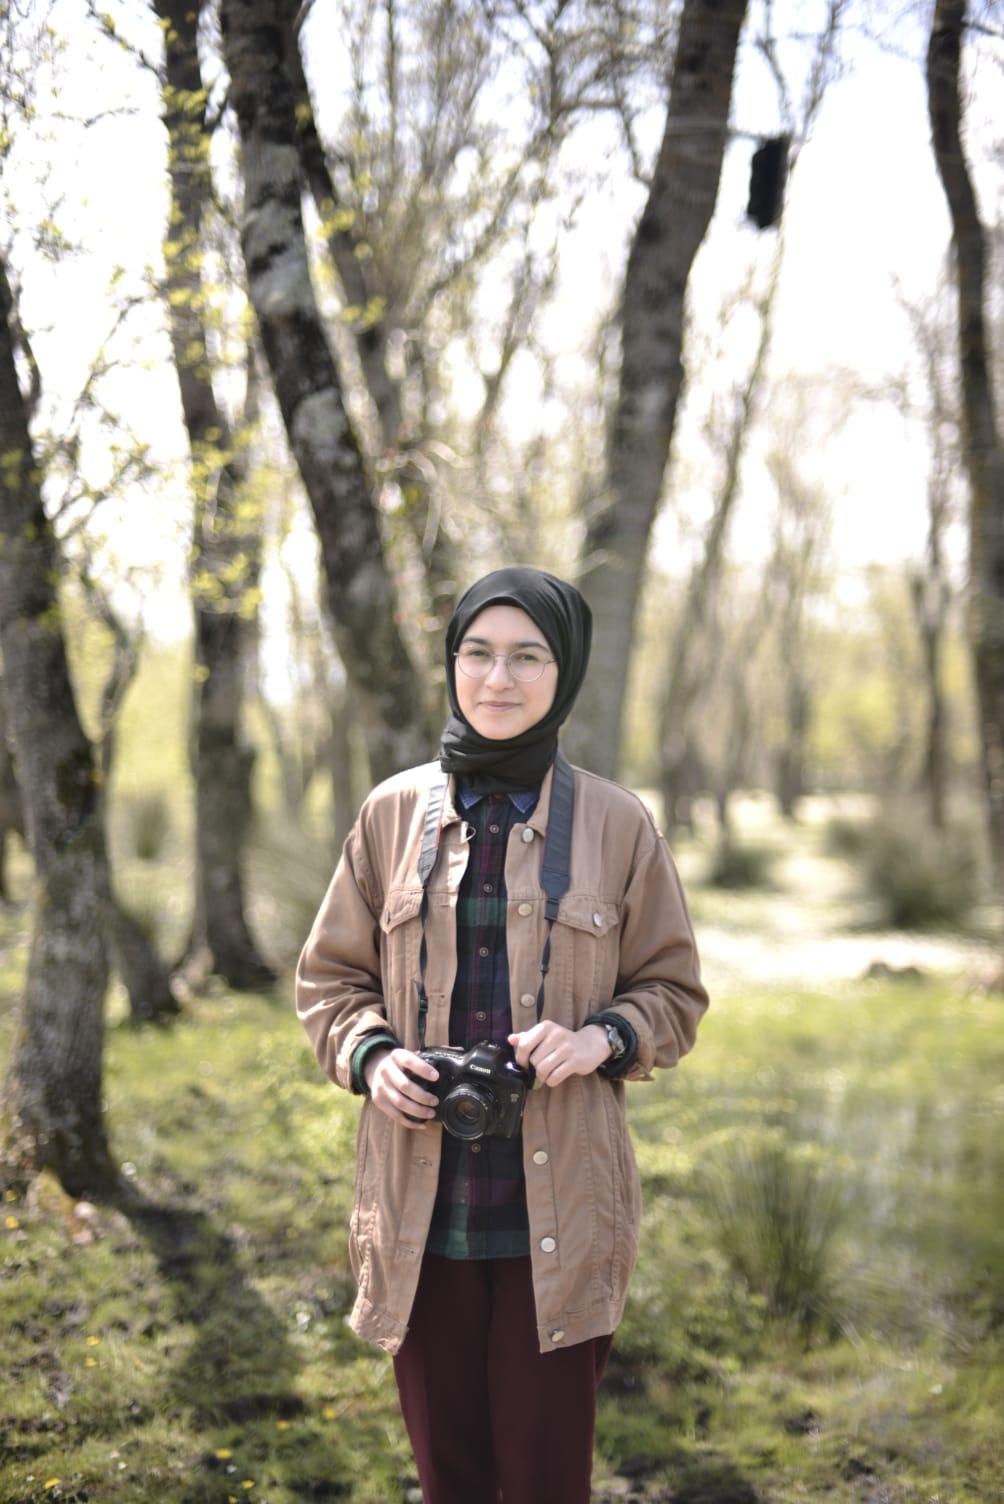 Sabiha Nurcan KURT